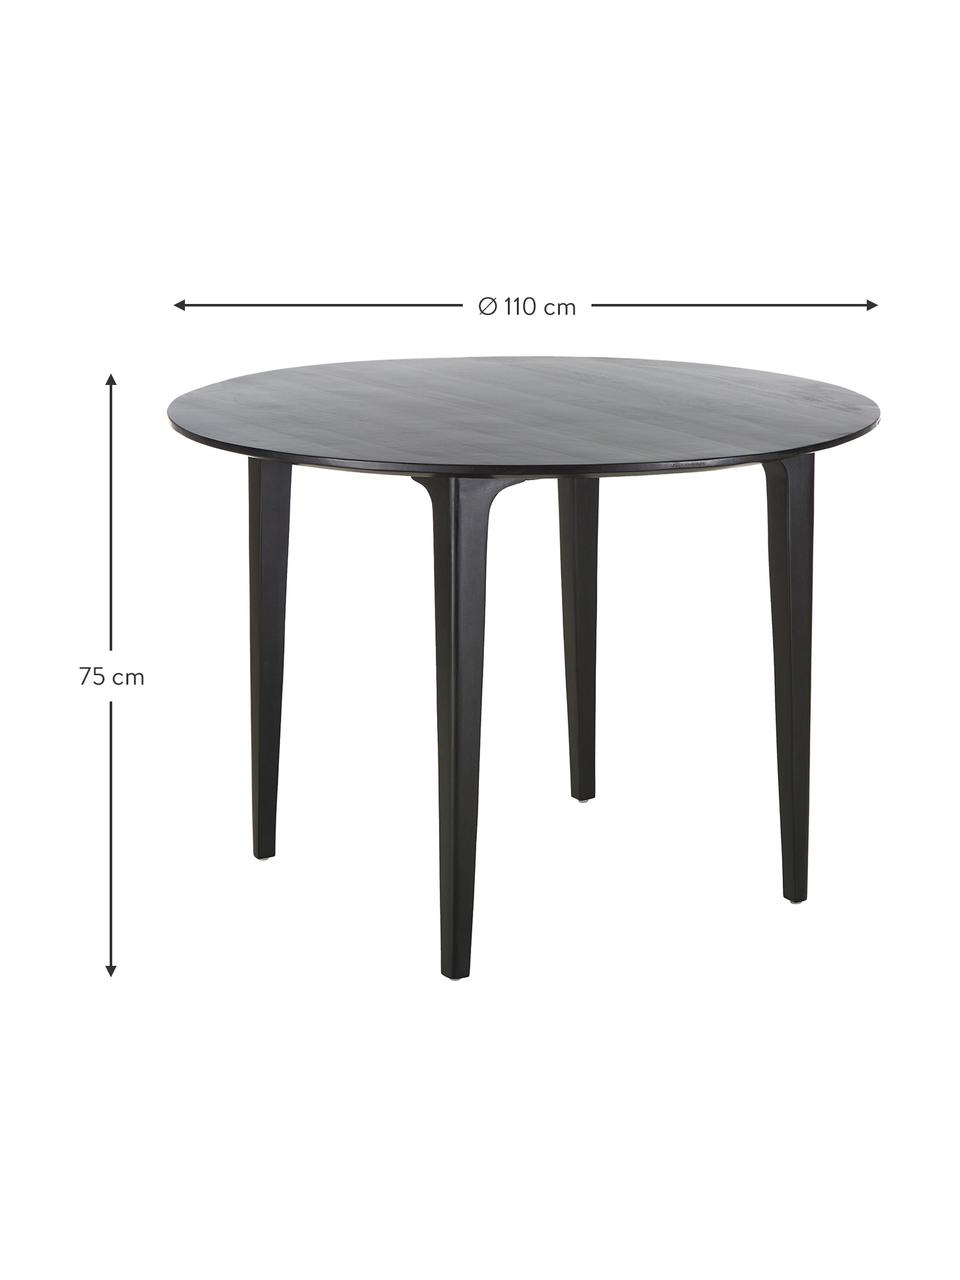 Runder Massivholz Esstisch Archie, Massives Mangoholz, lackiert, Mangoholz, schwarz lackiert, Ø 110 x H 75 cm